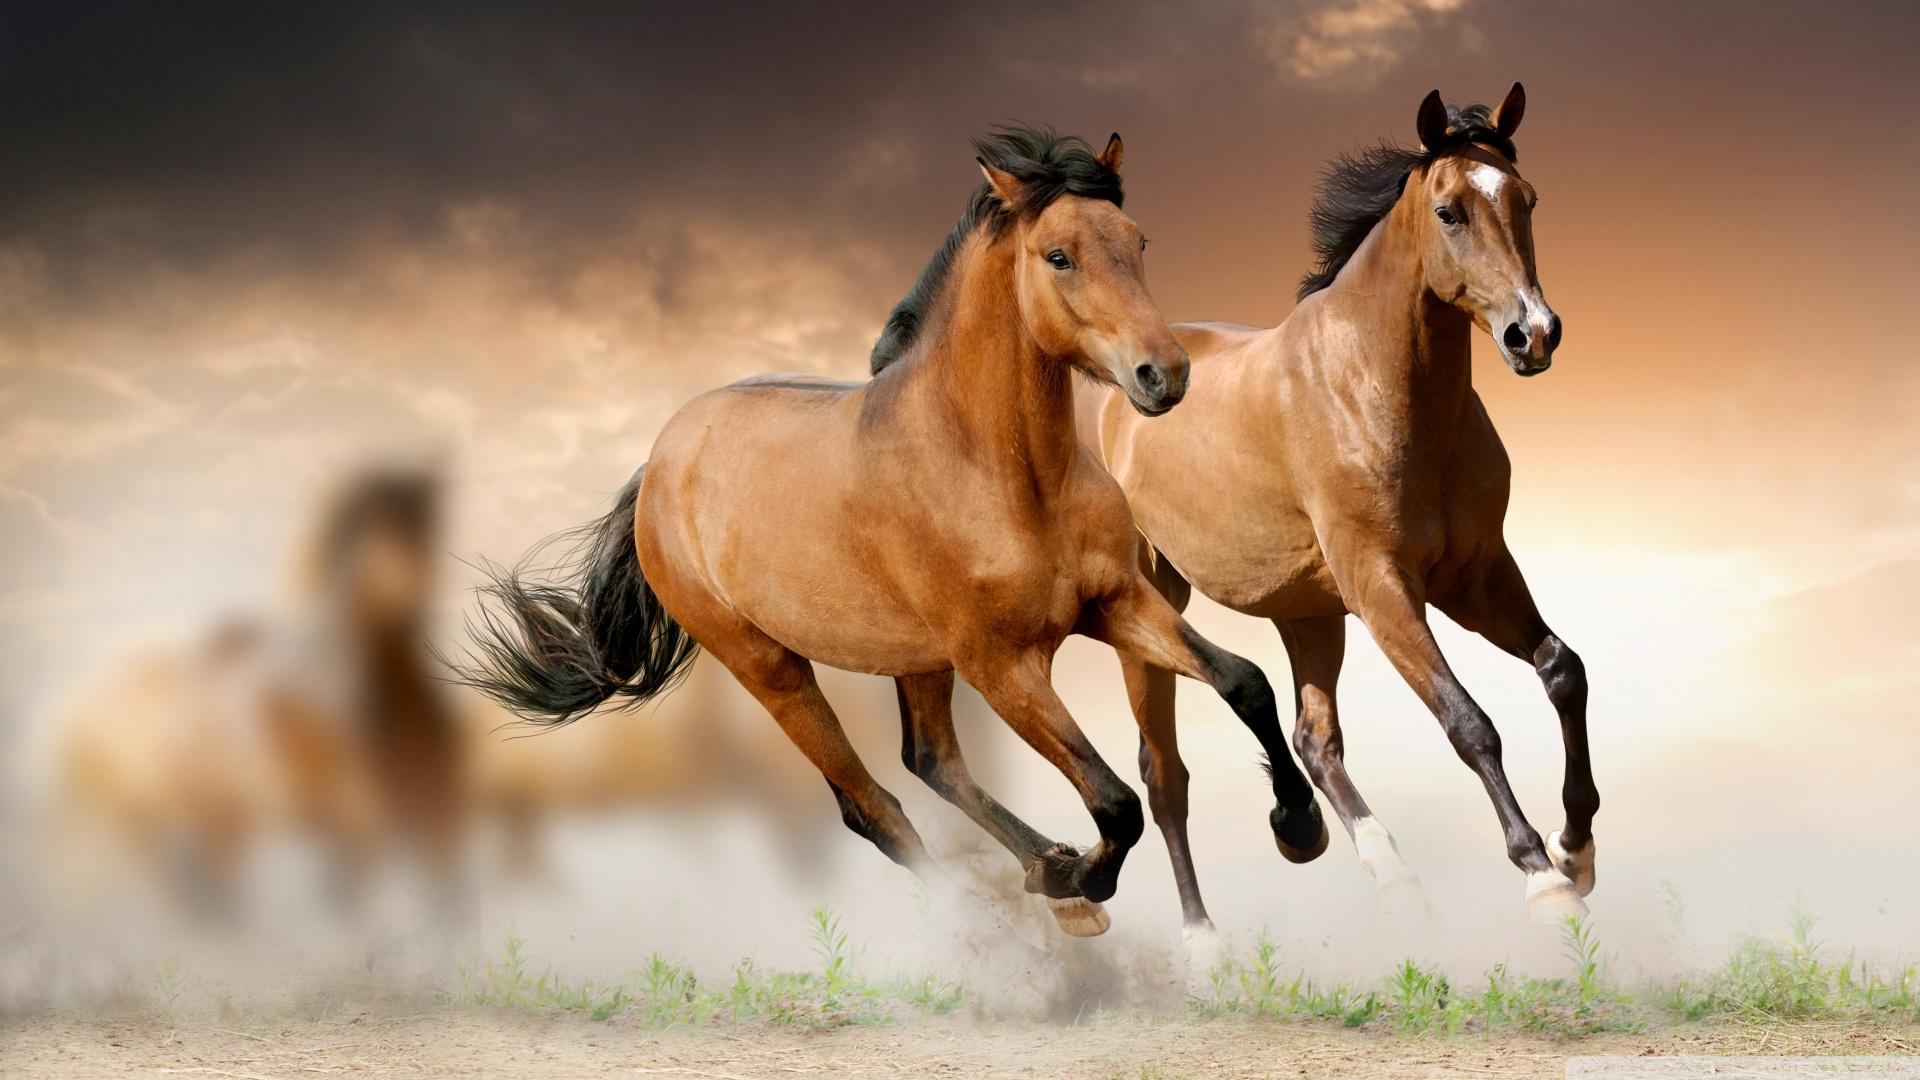 Horse Wallpapers Best Wallpapers 1920x1080